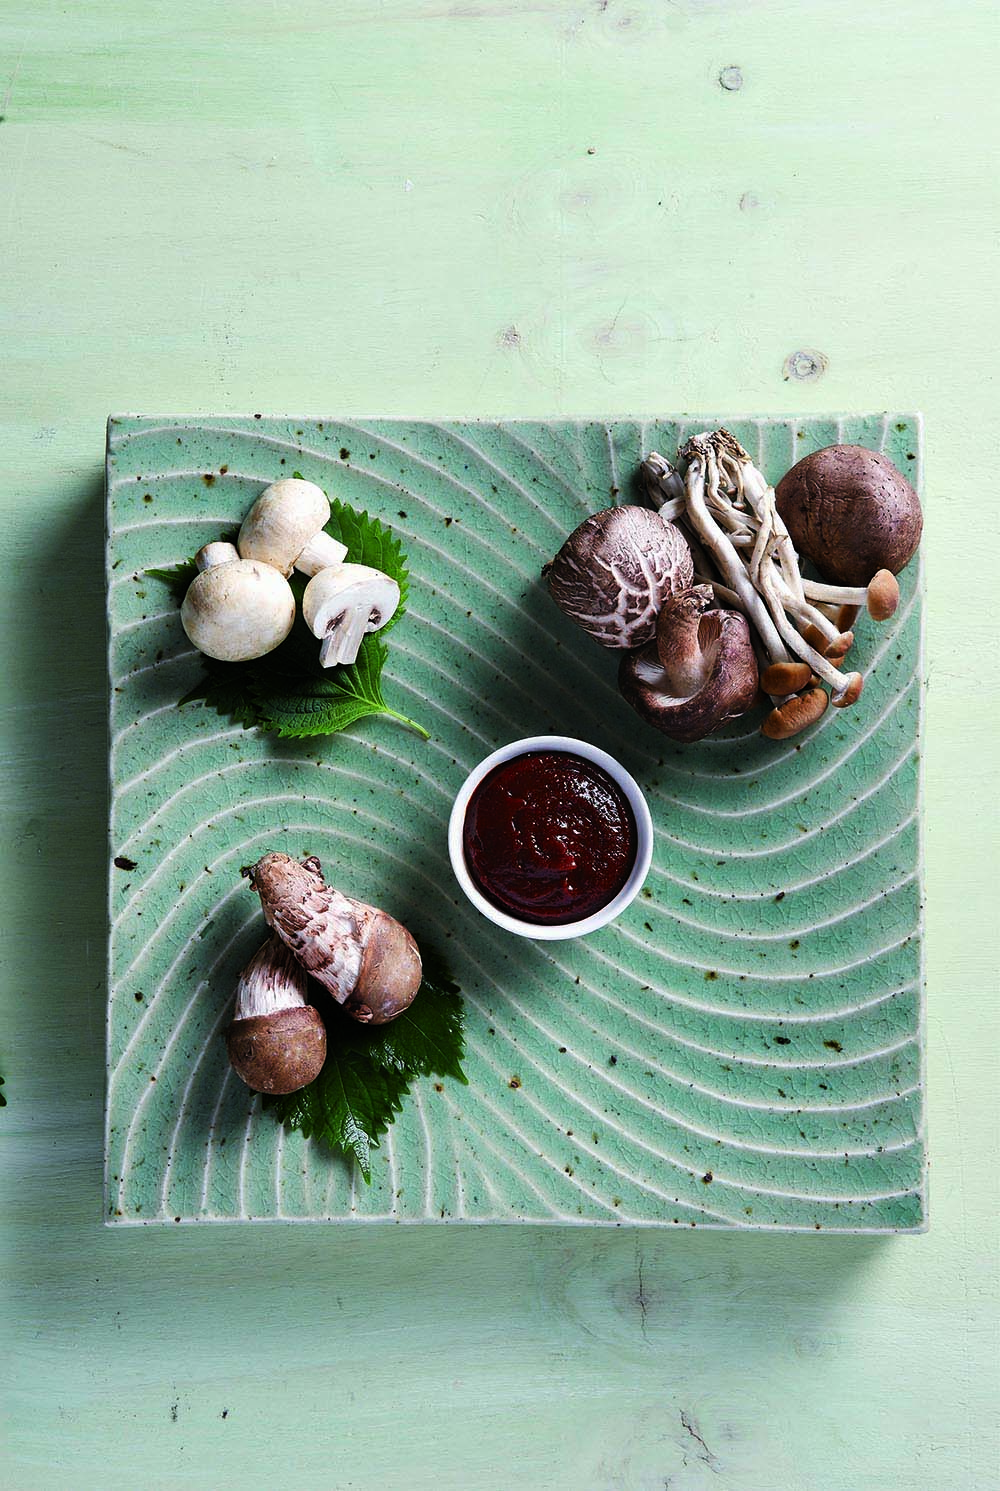 korea slow food salone del gusto excellence magazine